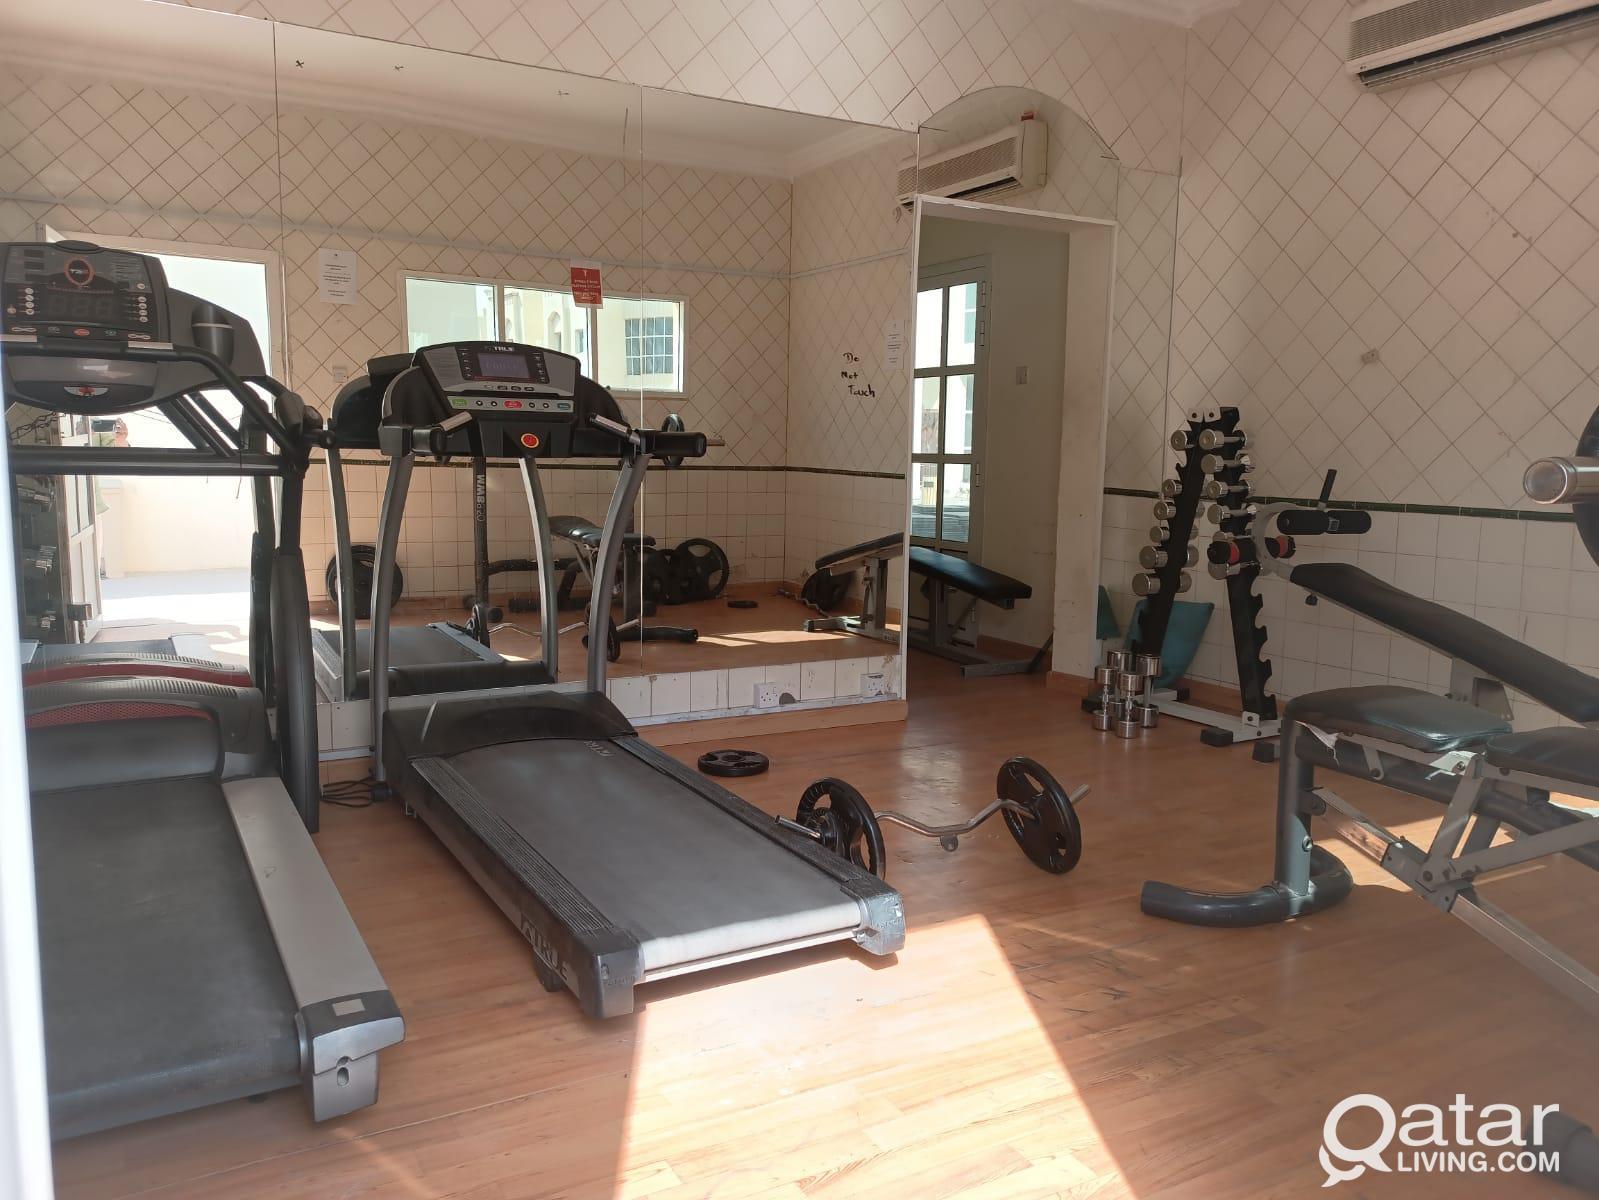 5 bhk compound villa for rent in  Al wakra